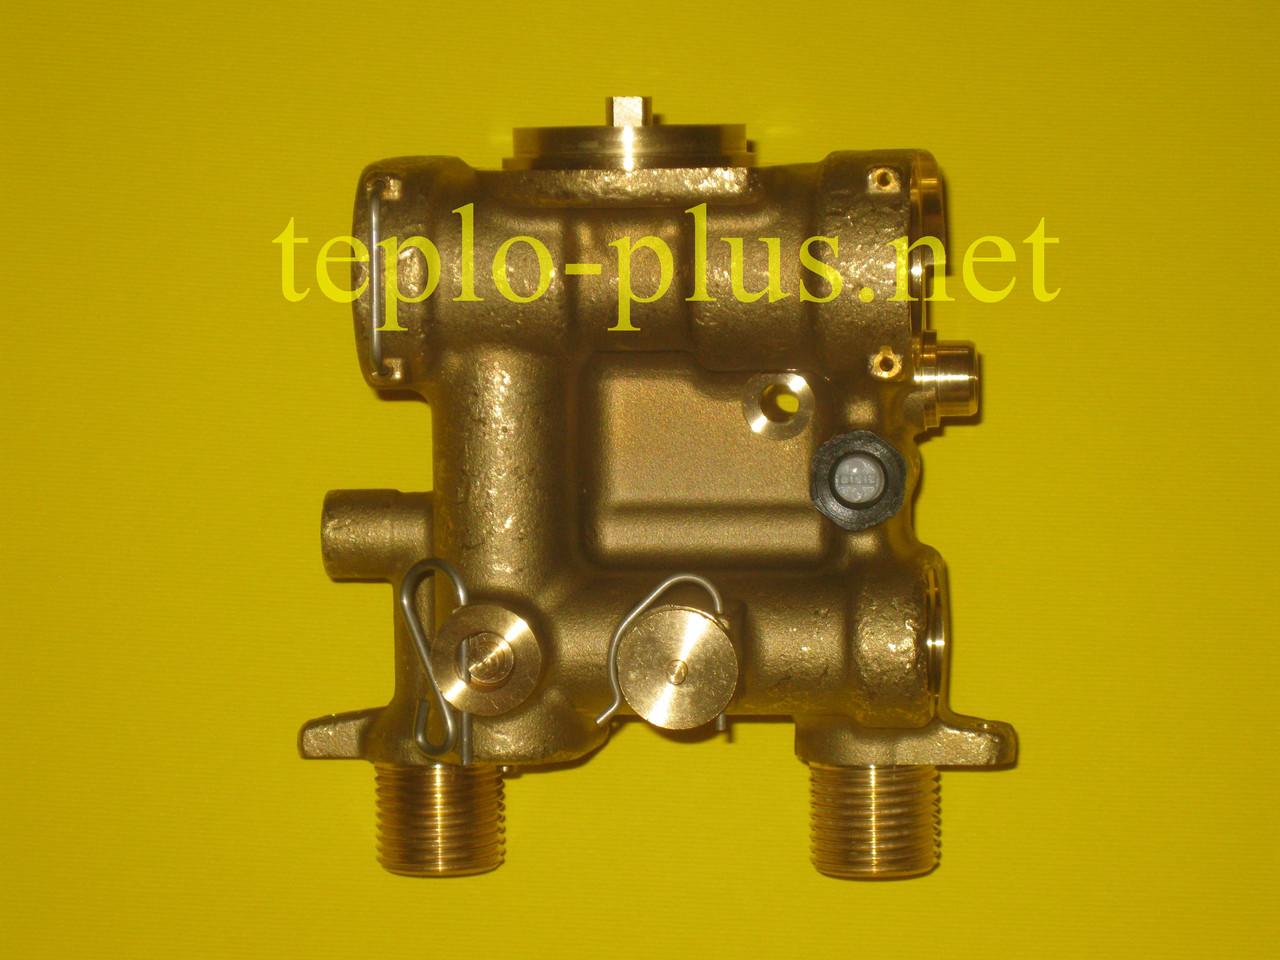 Корпус (латунный) клапана трехходового Sime Format.Zip BF TS, Format.Zip 5 25 BF TS